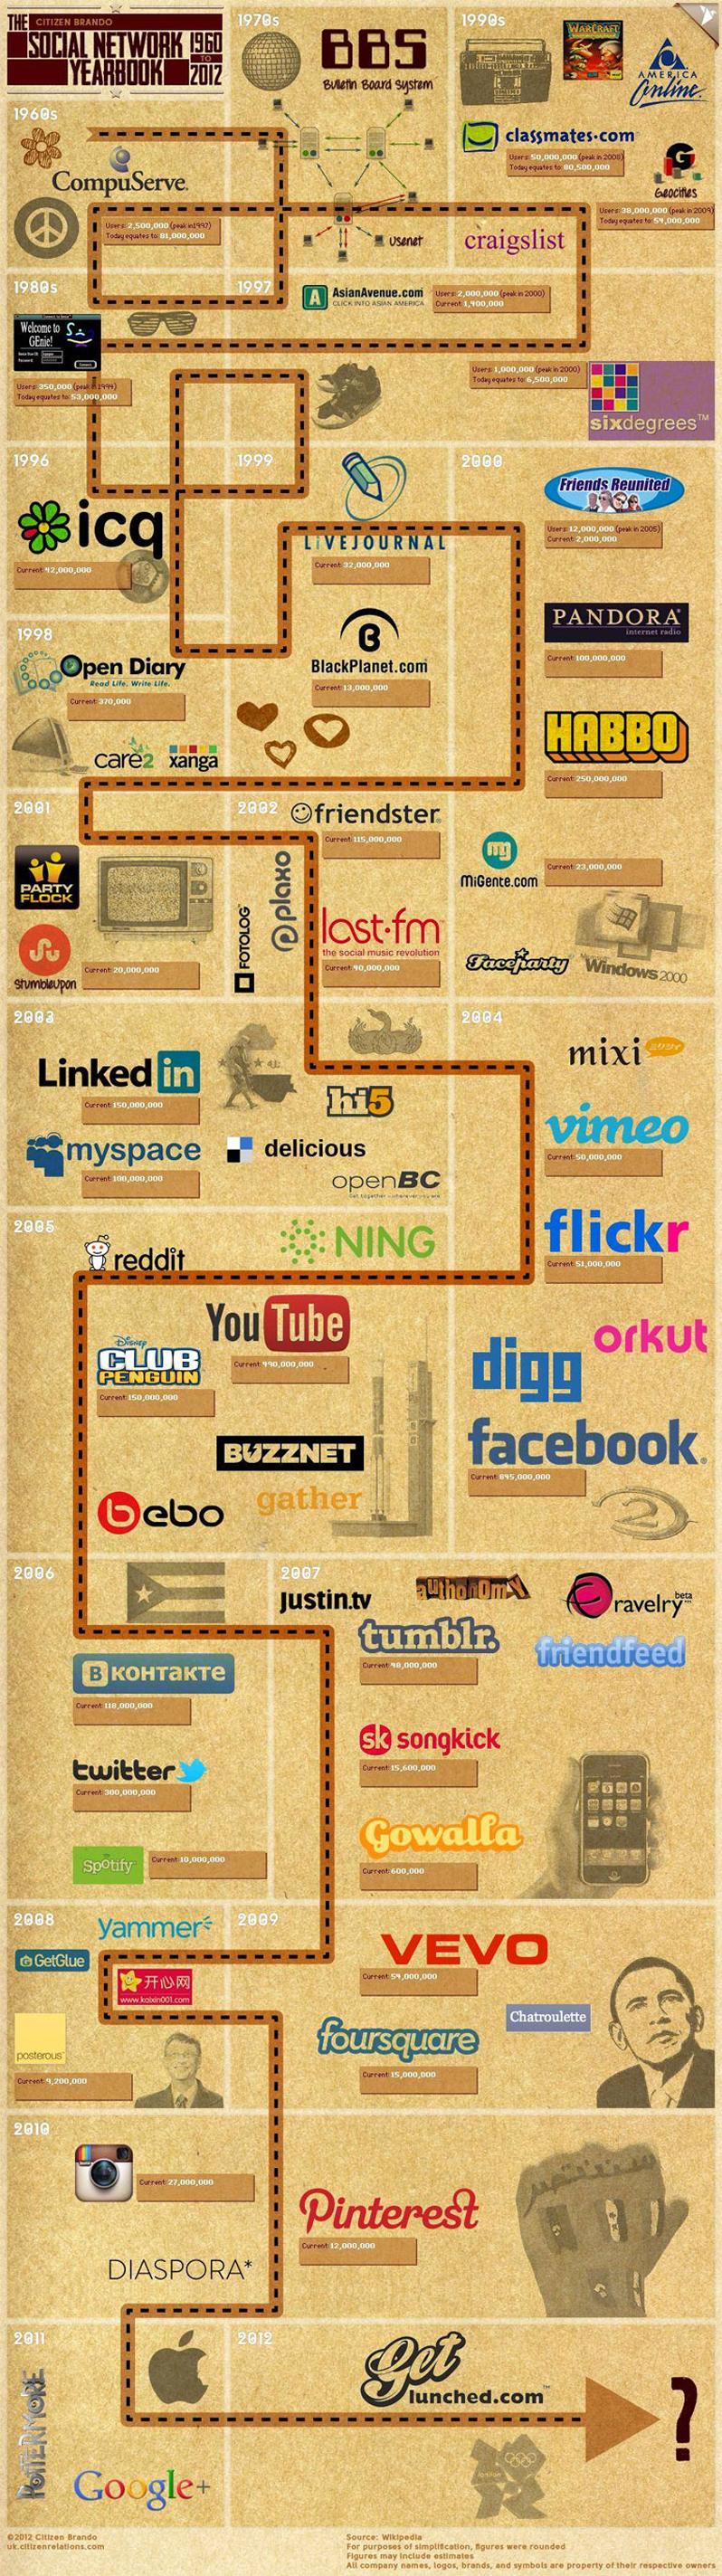 Infográfico: 50 anos de Redes Sociais e crescendo